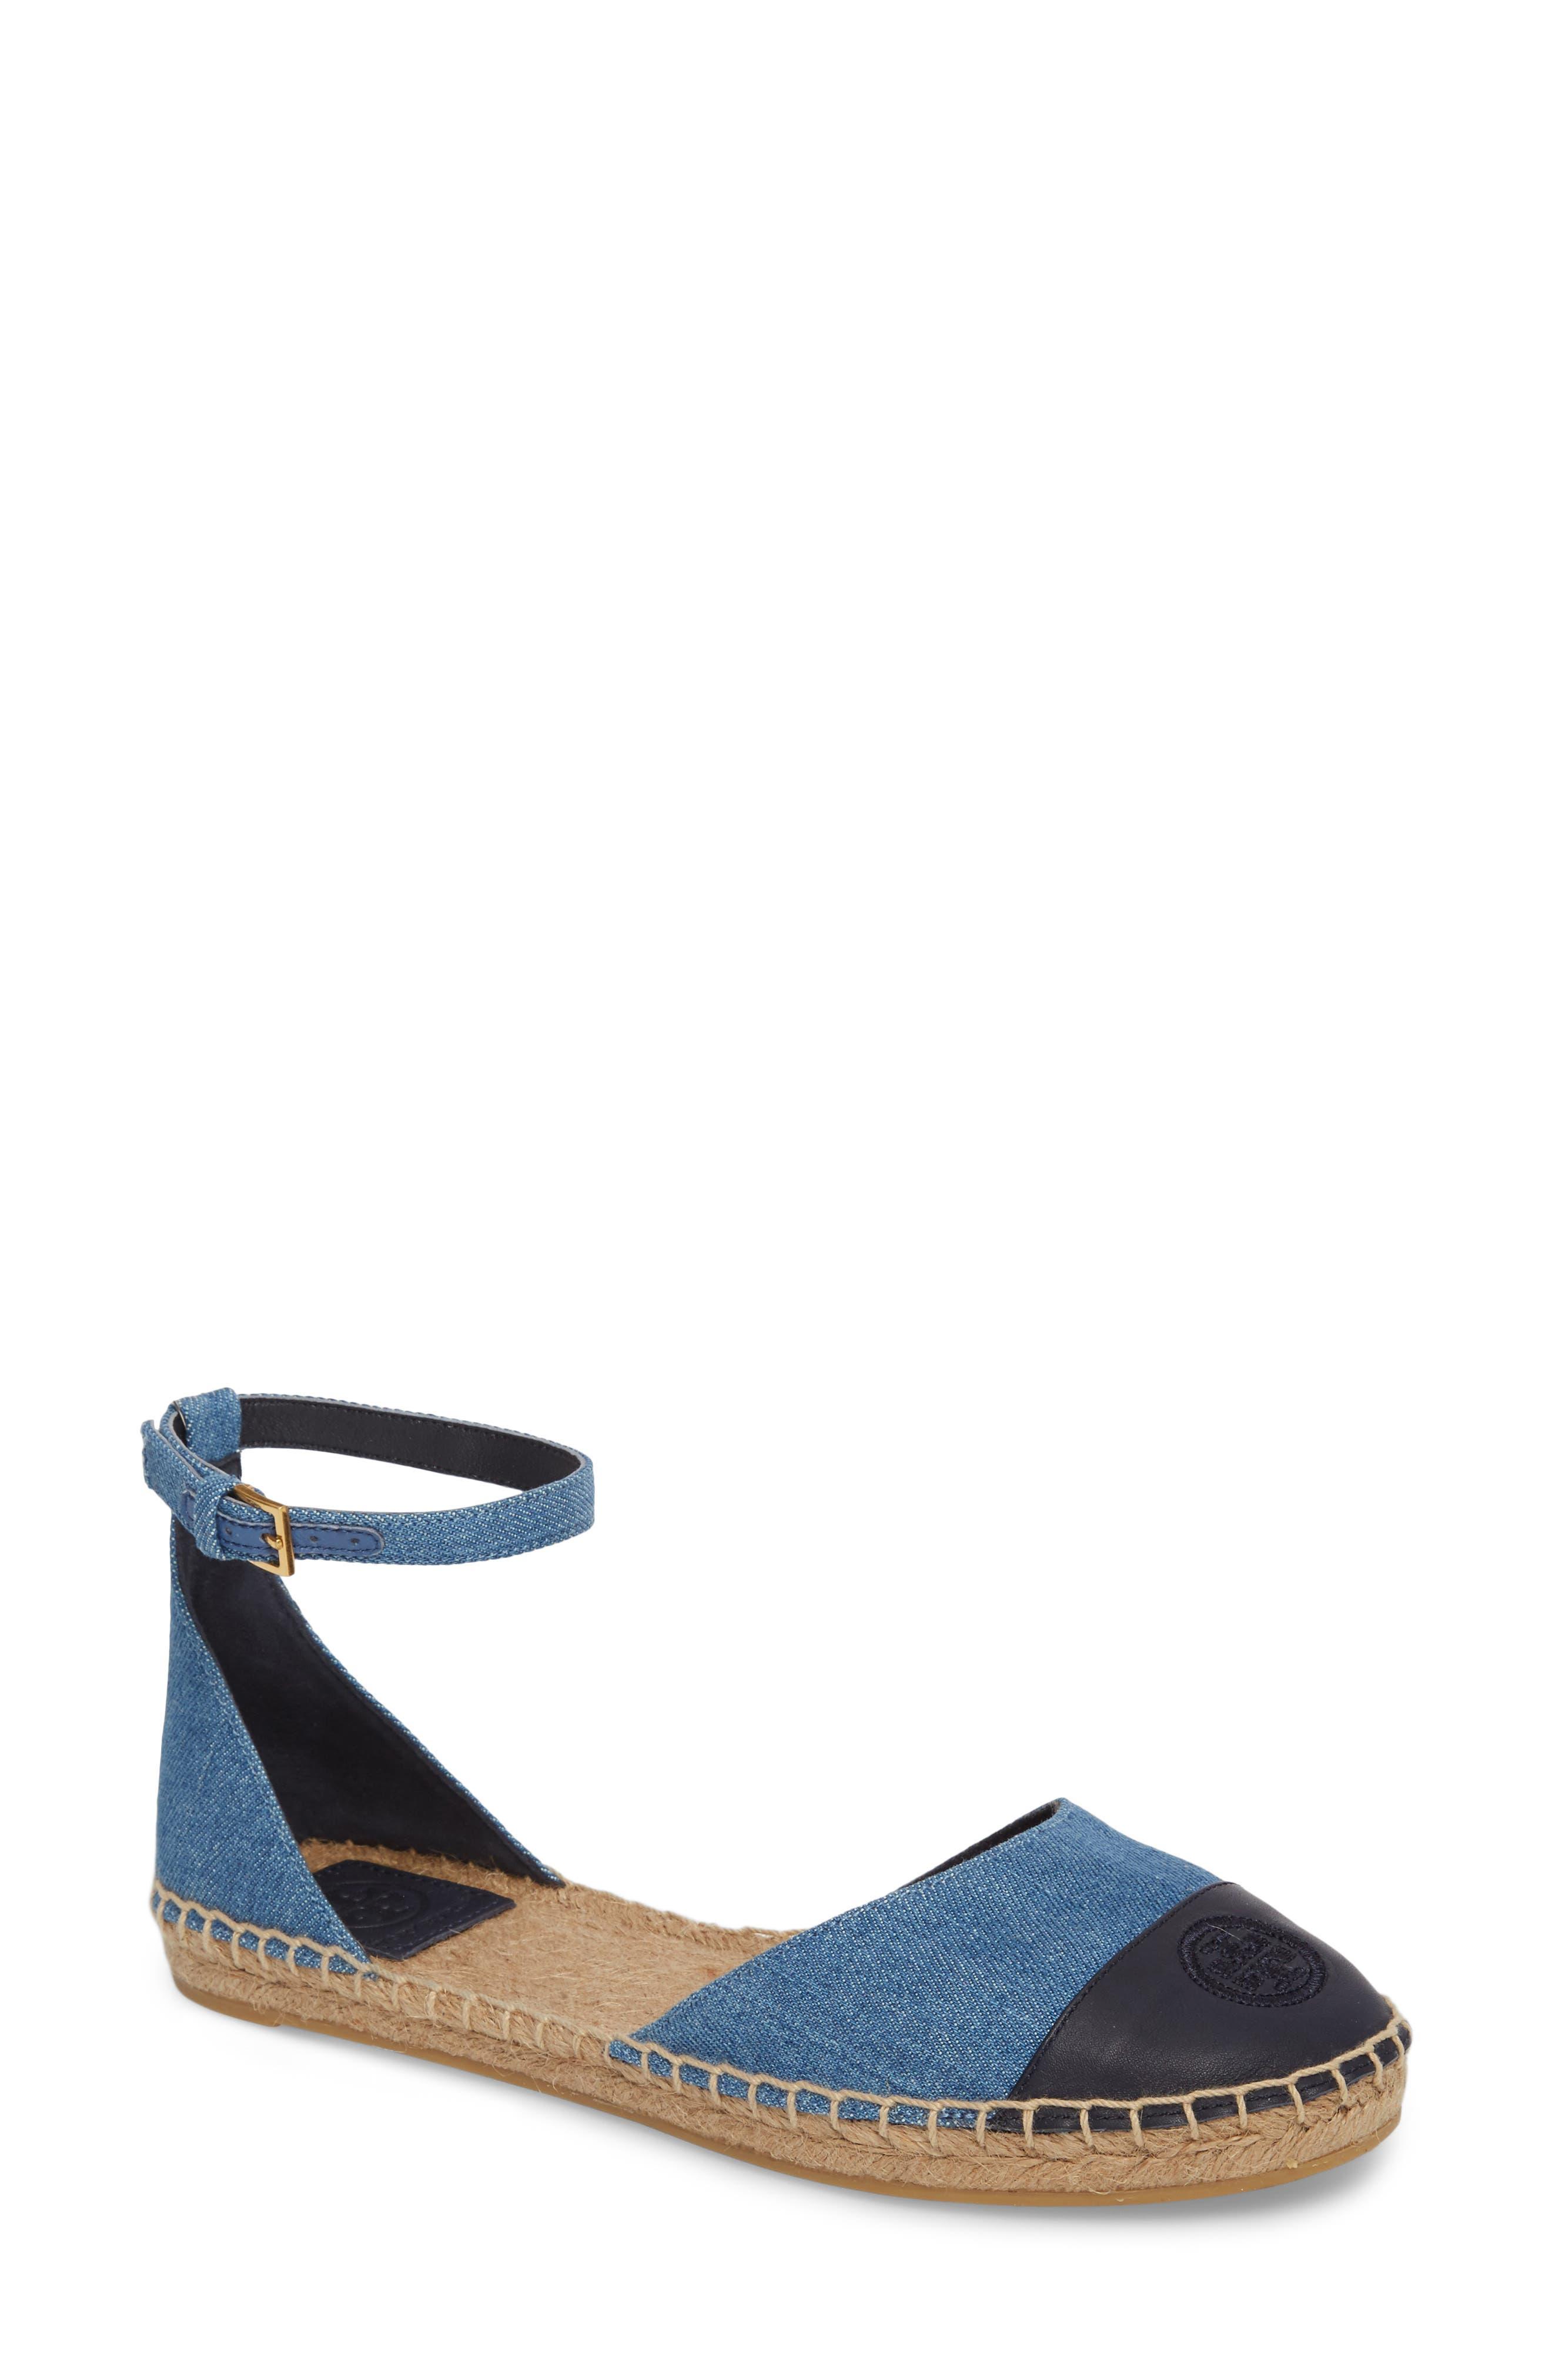 Tory Burch Ankle Strap Espadrille (Women)